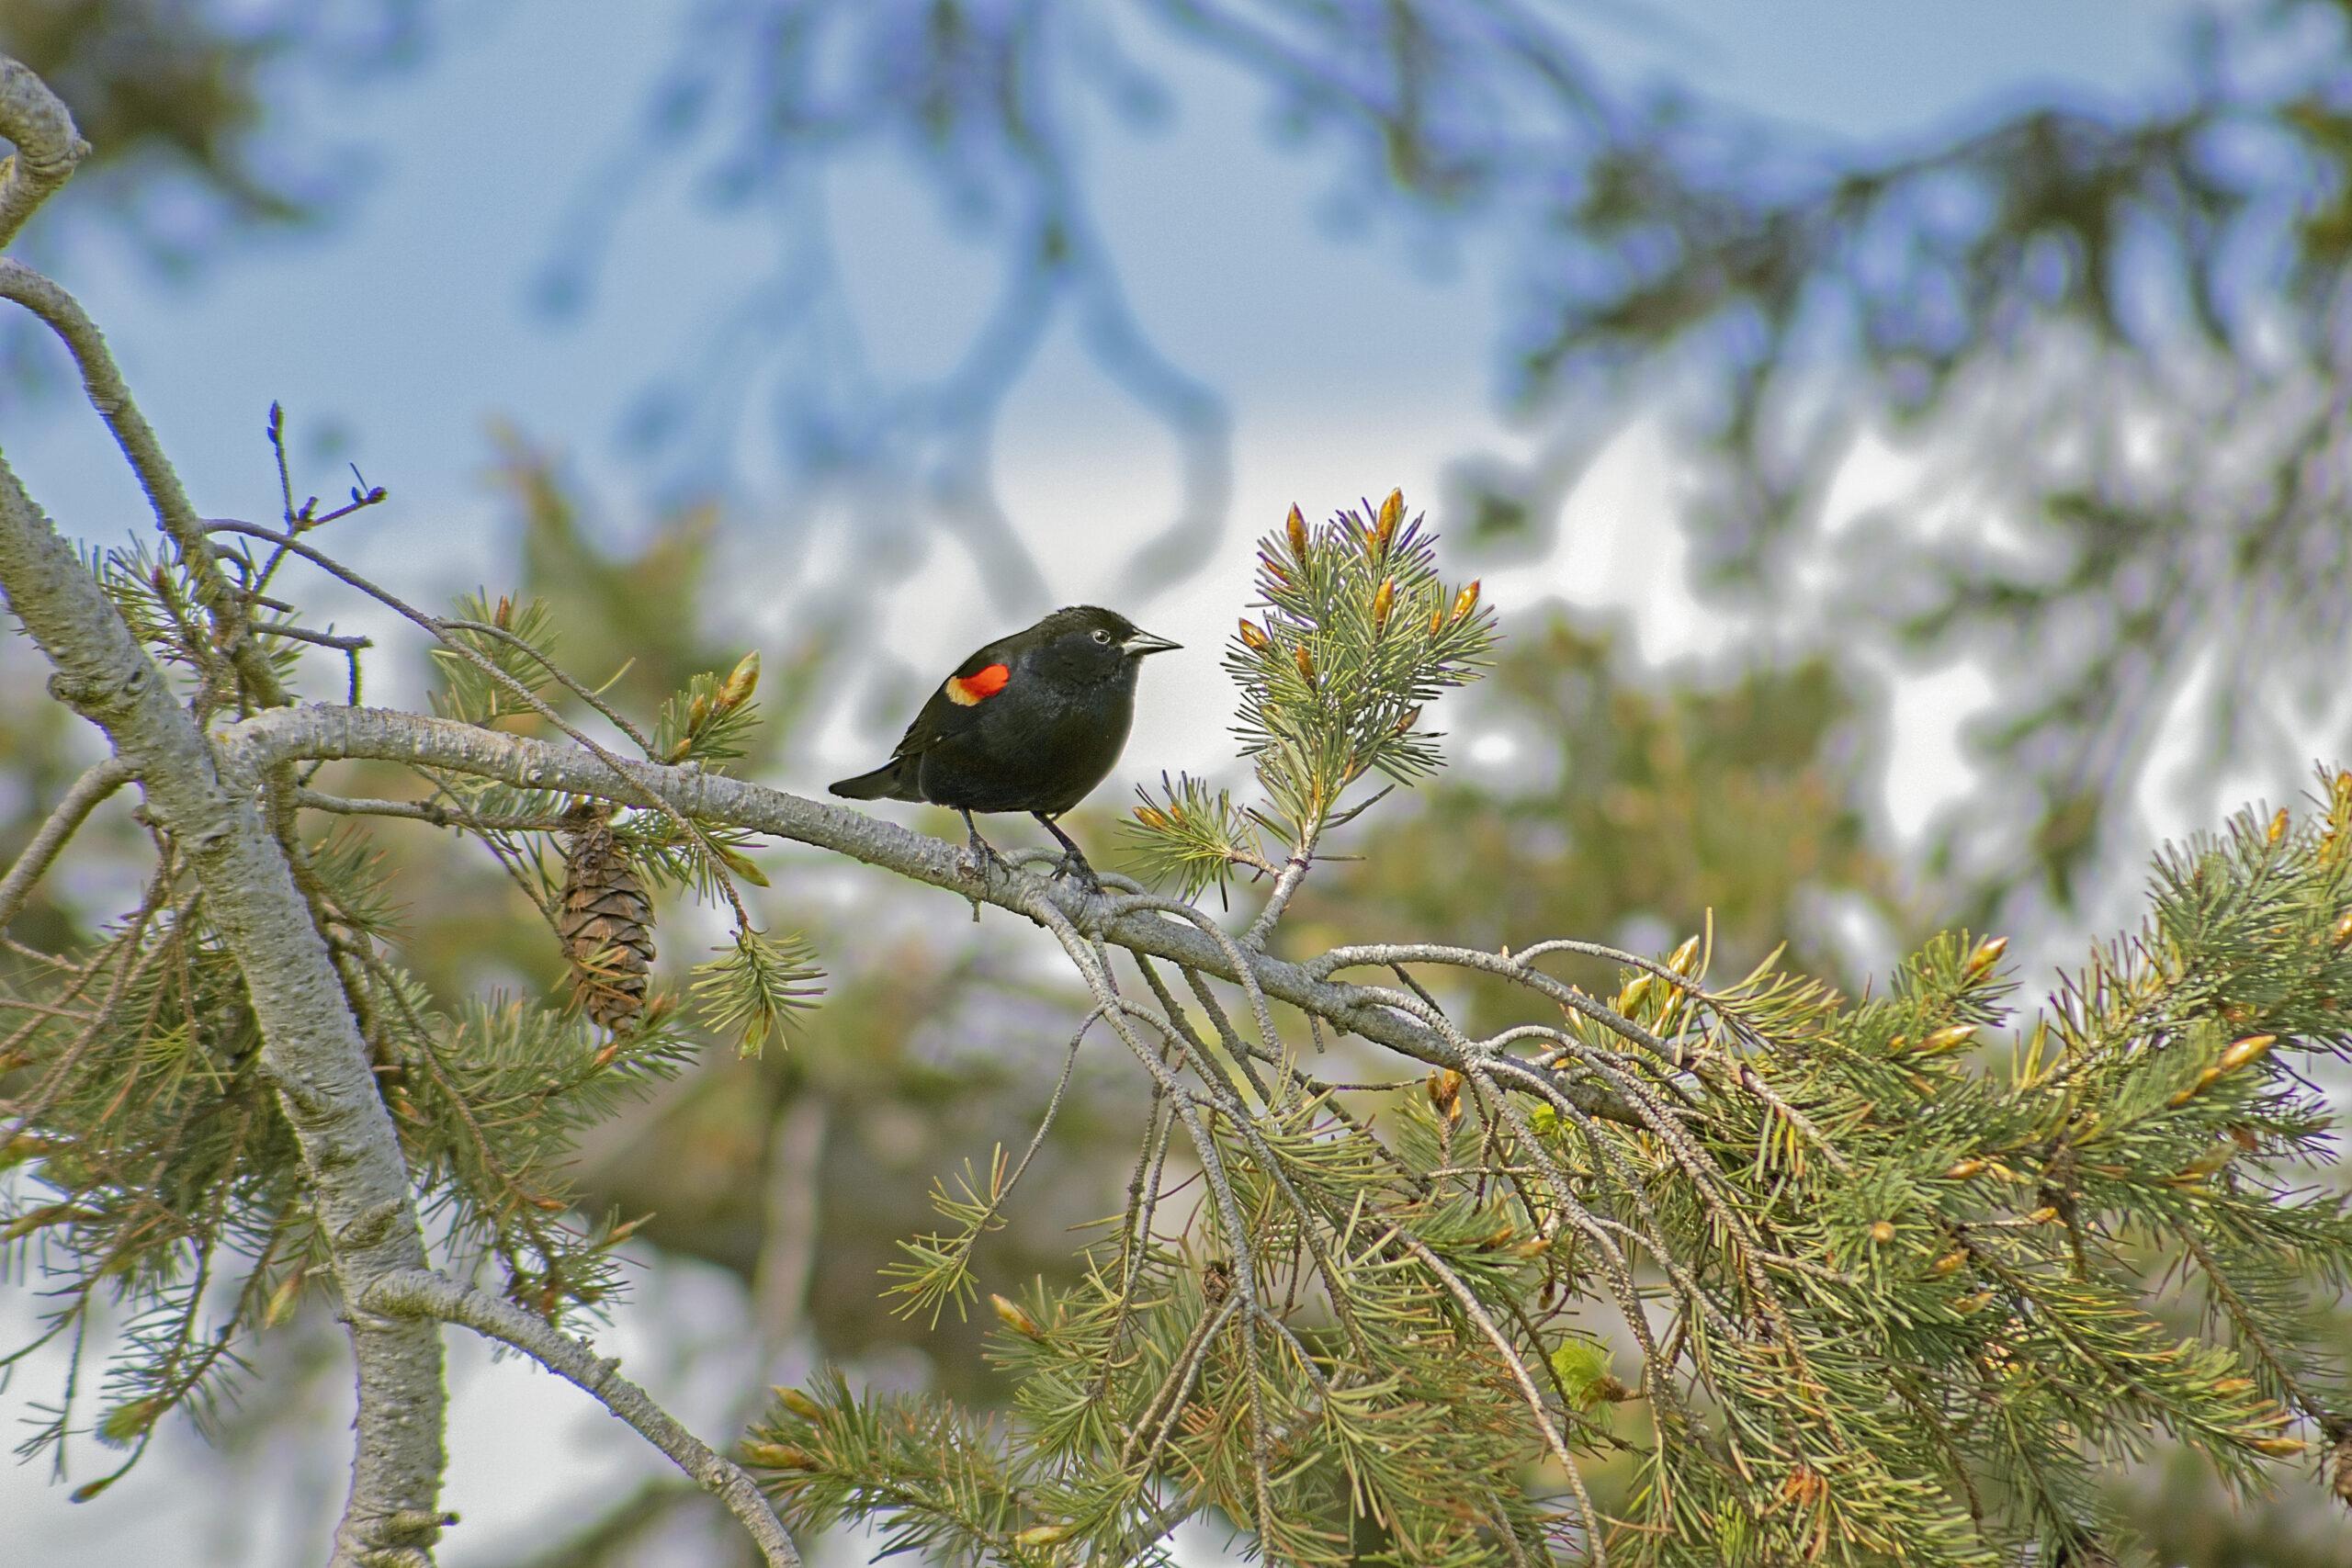 Redwing Blackbird at Boundary Bay, April 30, 2021